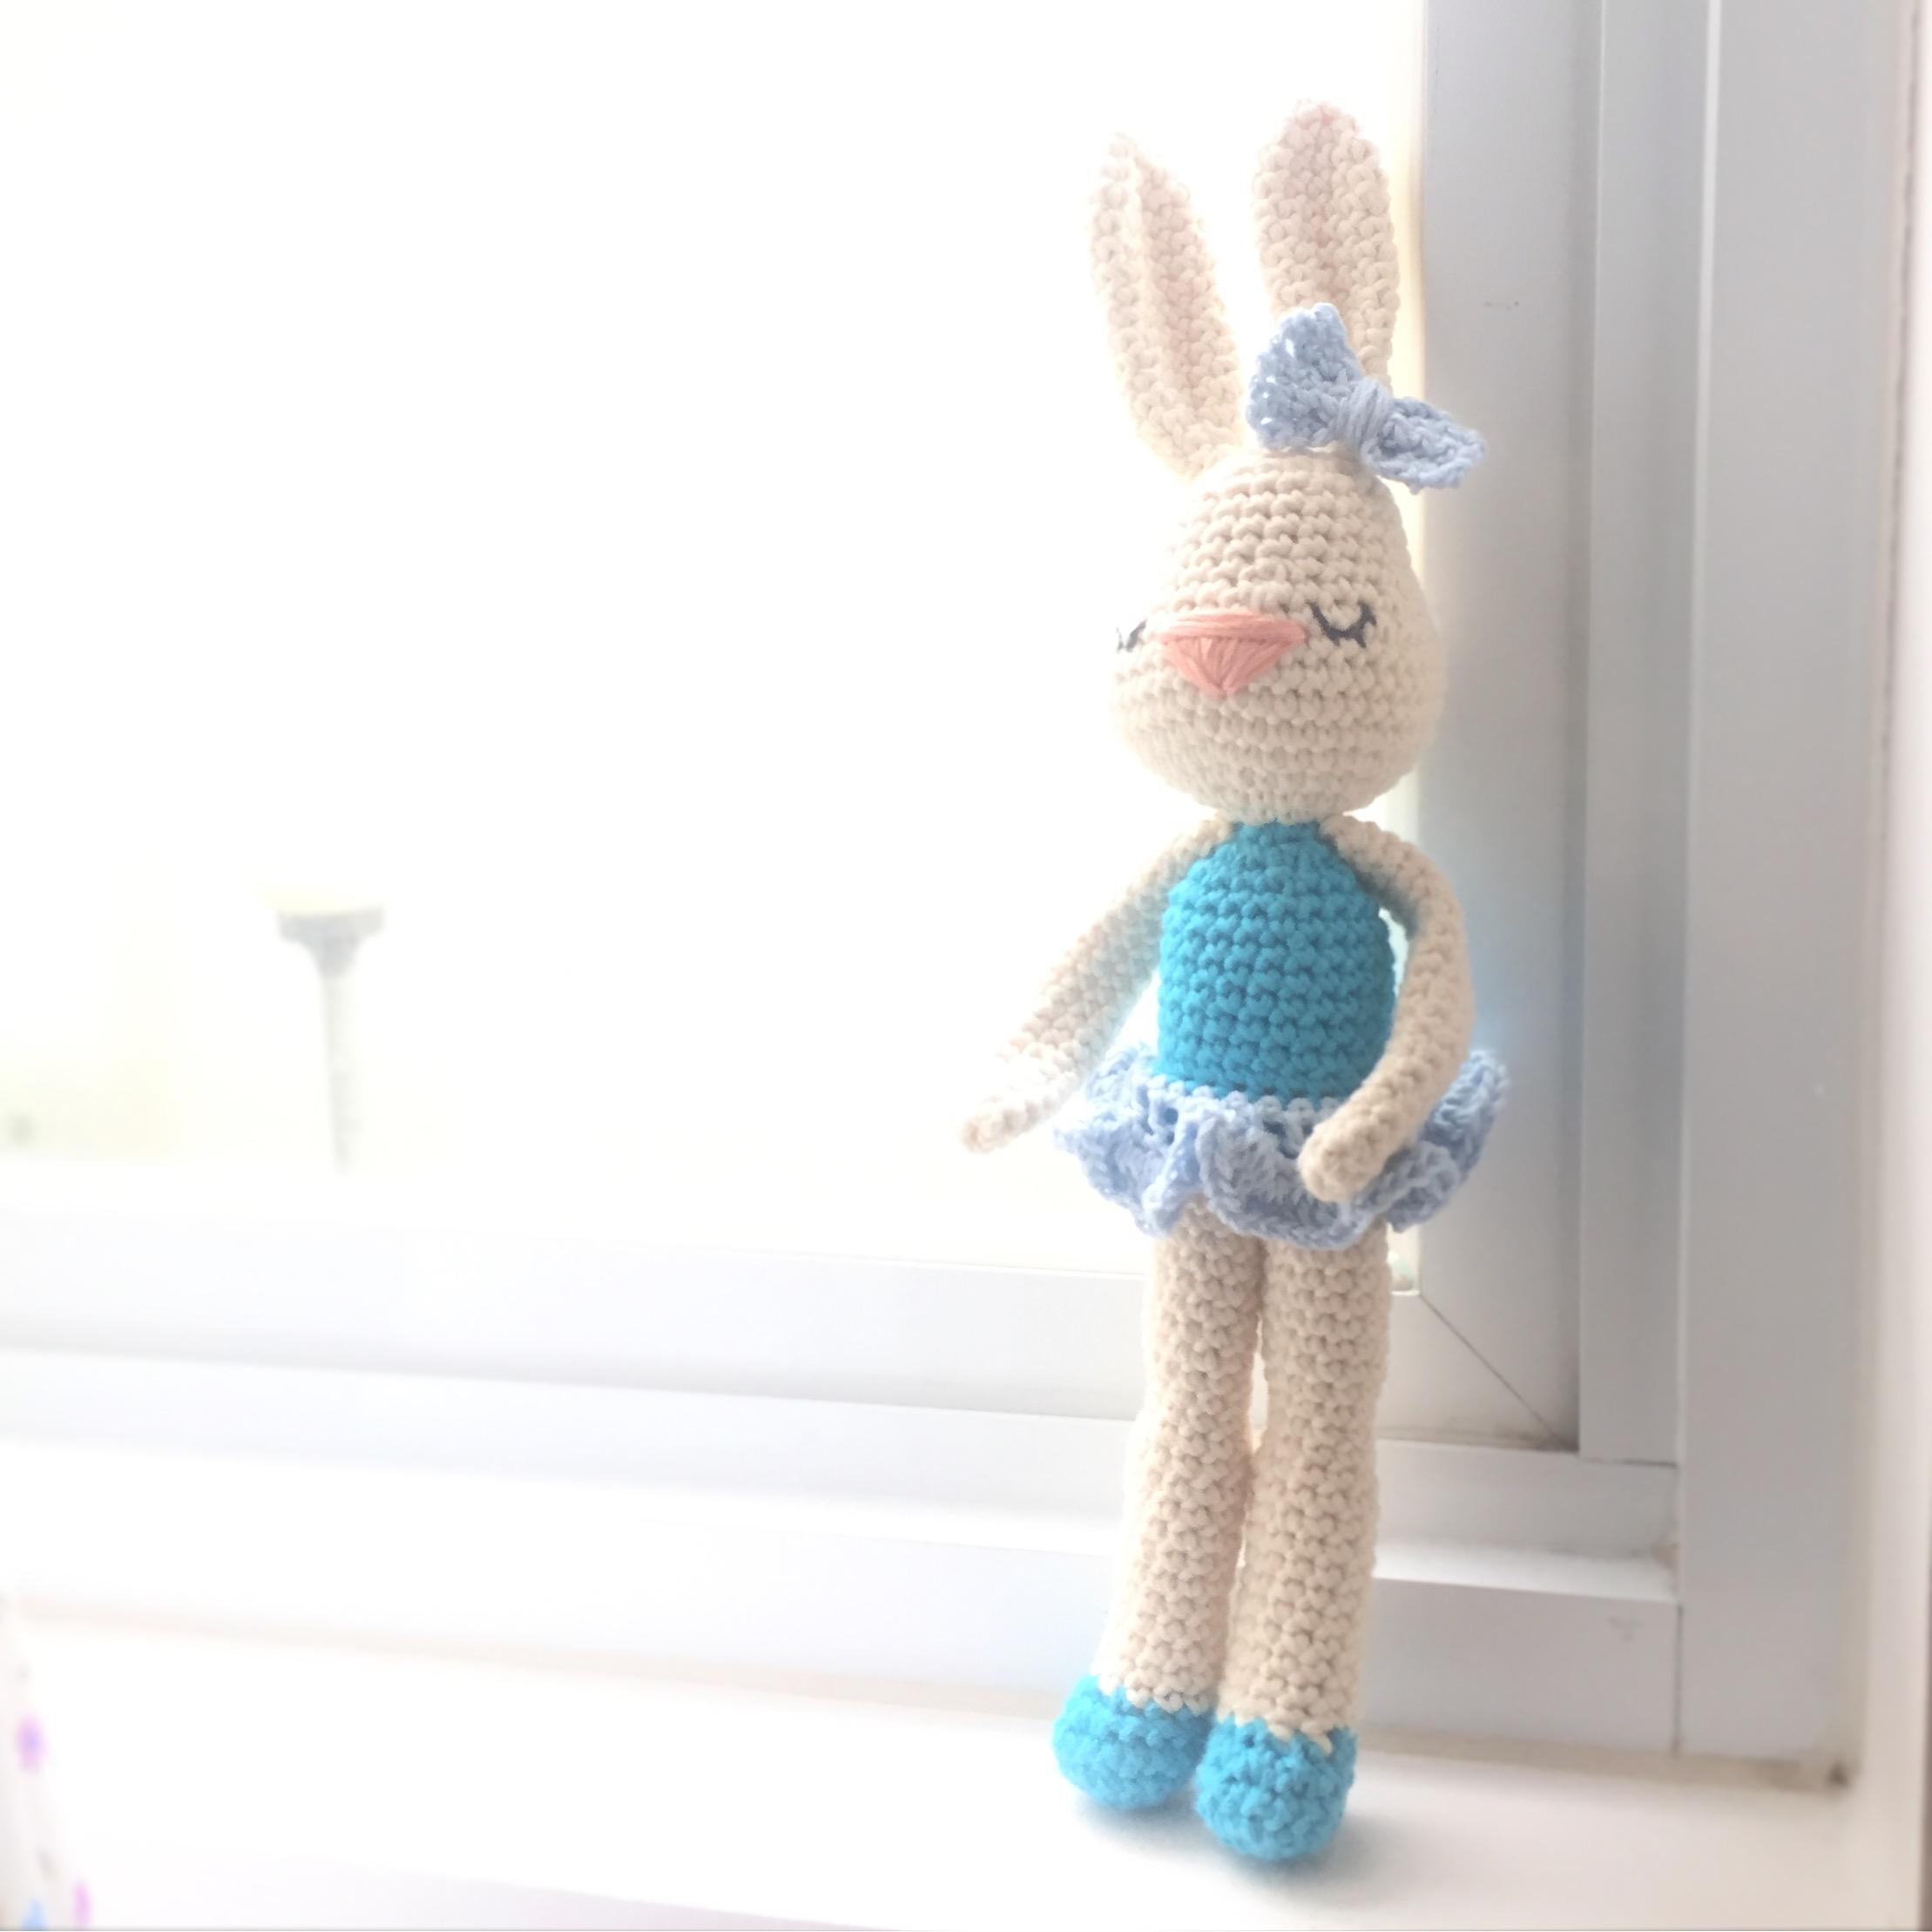 Cat Ballerina Amigurumi Doll - Free Crochet Pattern! - AmVaBe Crochet | 2218x2218